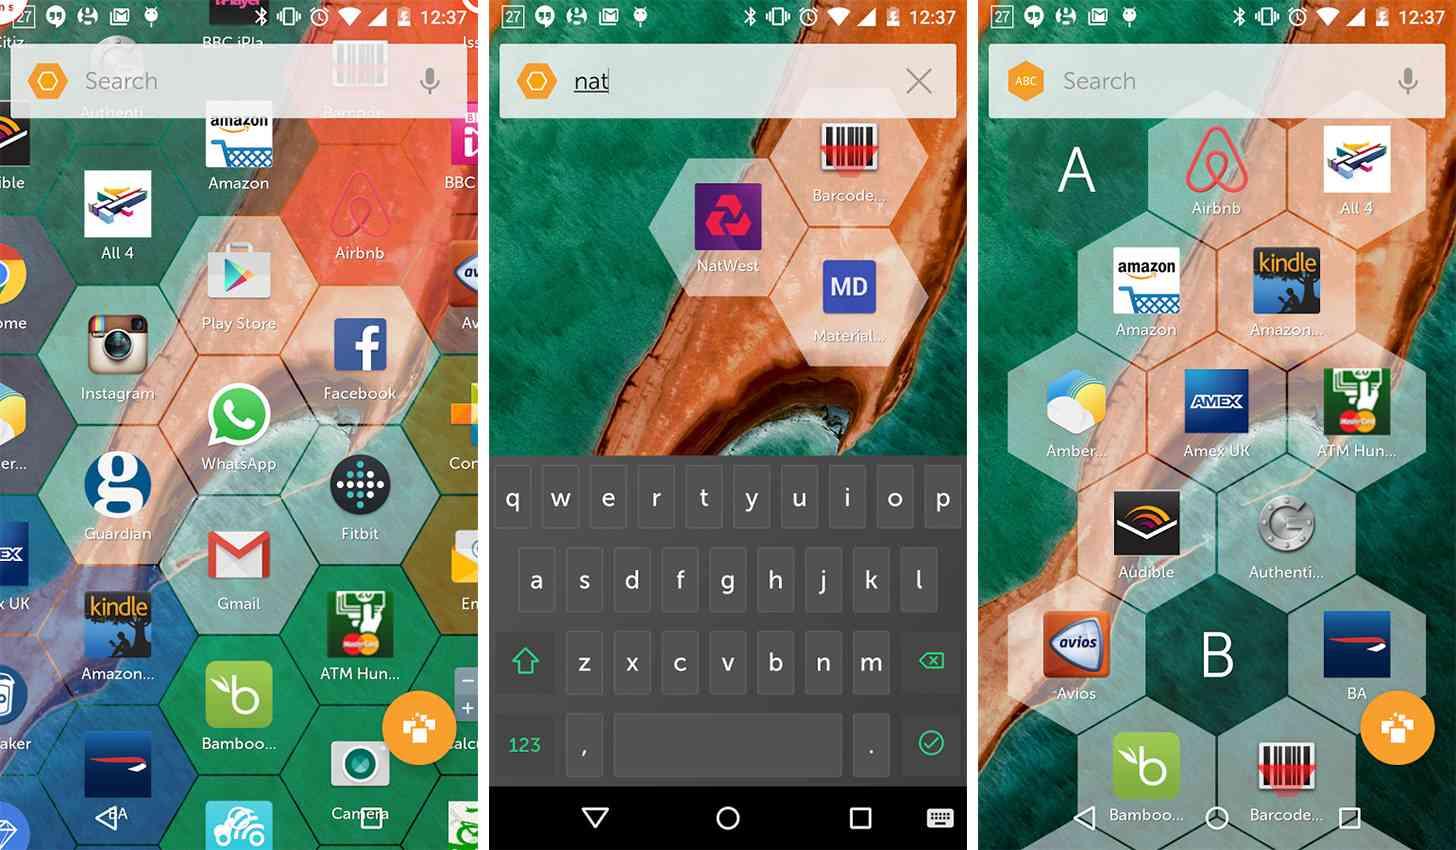 Hexy Launcher Android app screenshots